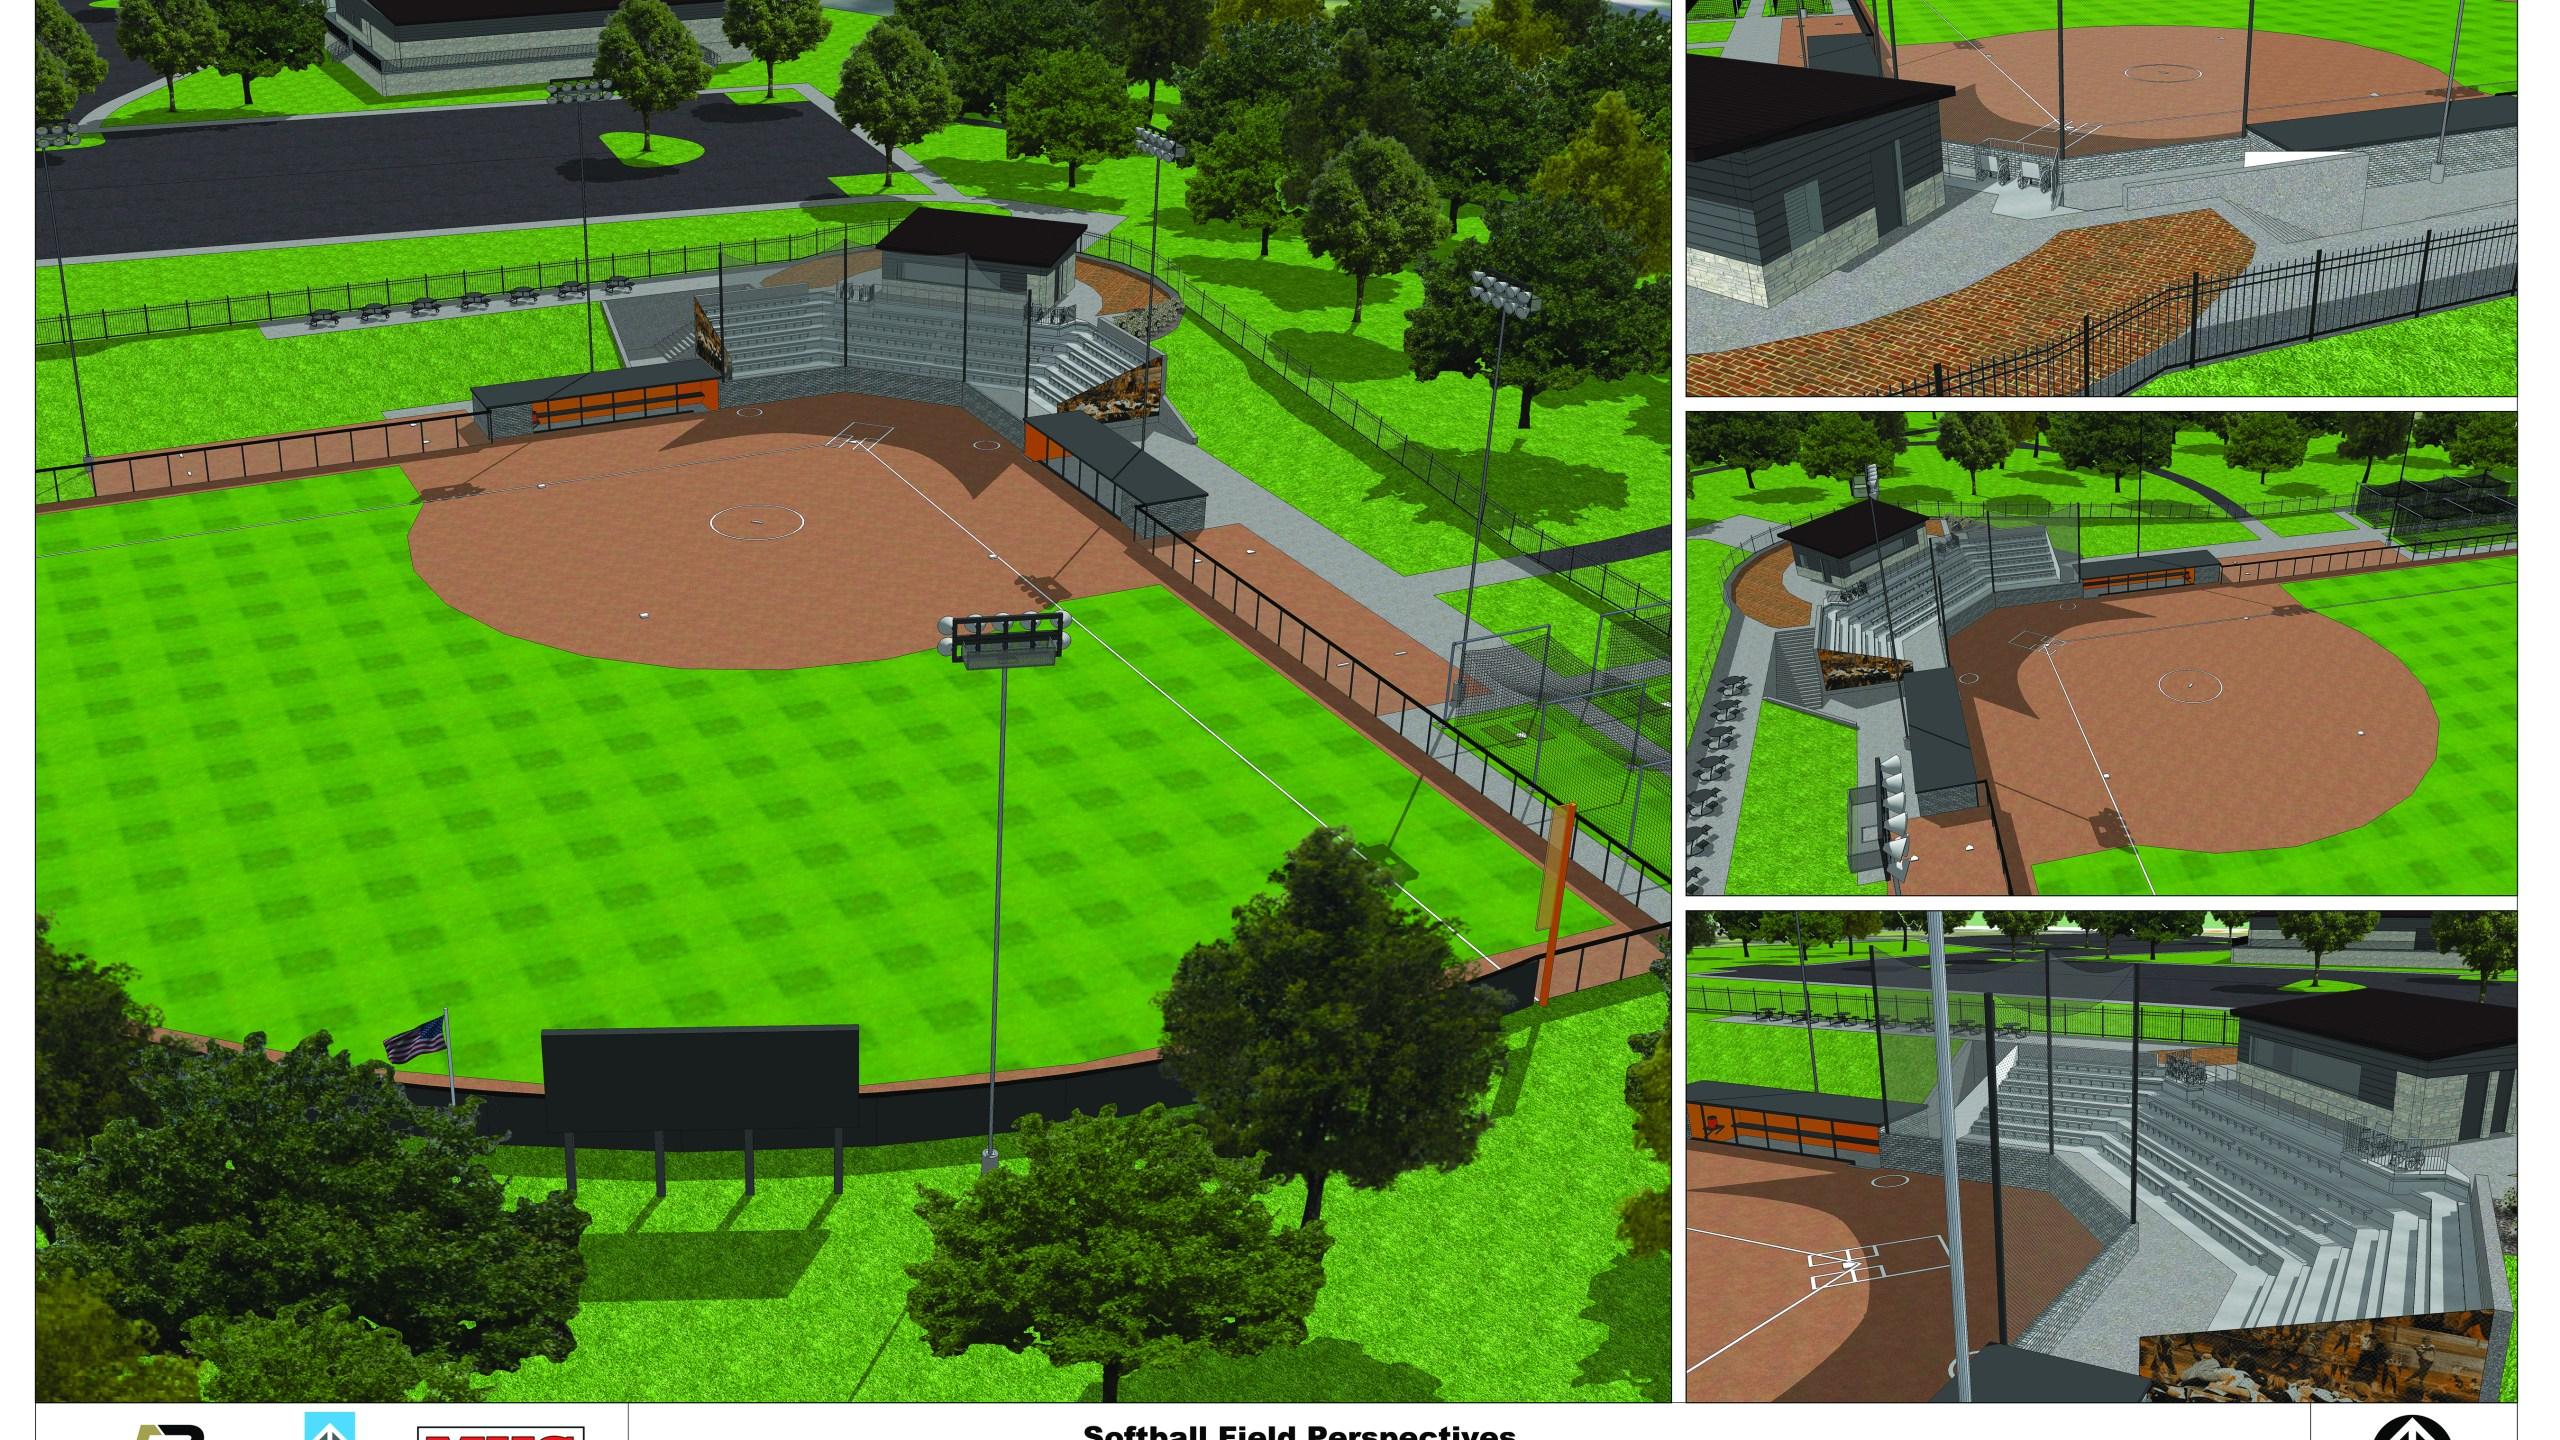 Indiana Tech softball stadium rendering_252142